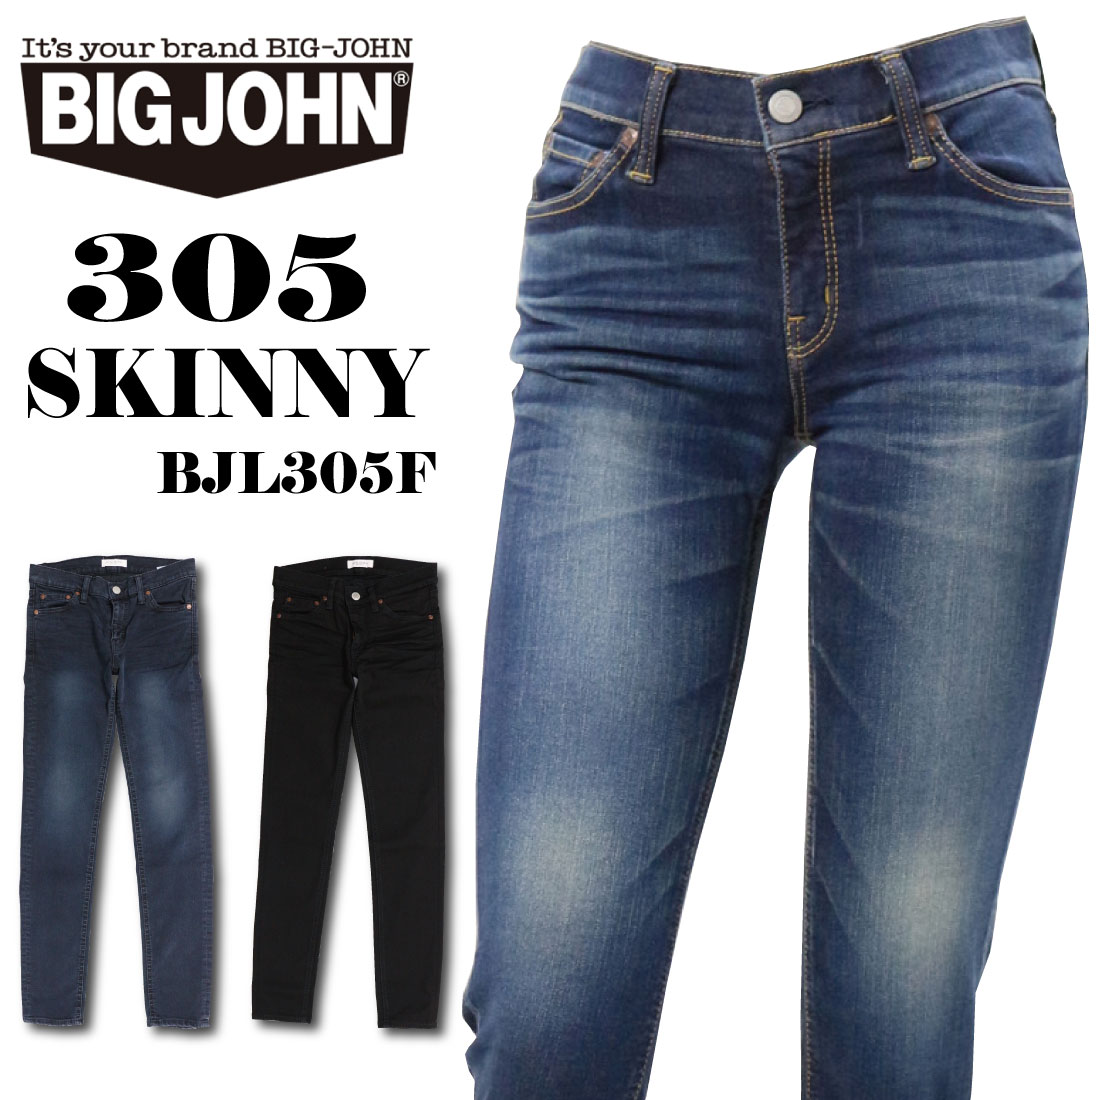 BIGJHON ビッグジョン BJL305F スキニー ジーンズ コンプリートフリー ストレッチ 美脚 レディース ボトムス 252/61S/D61